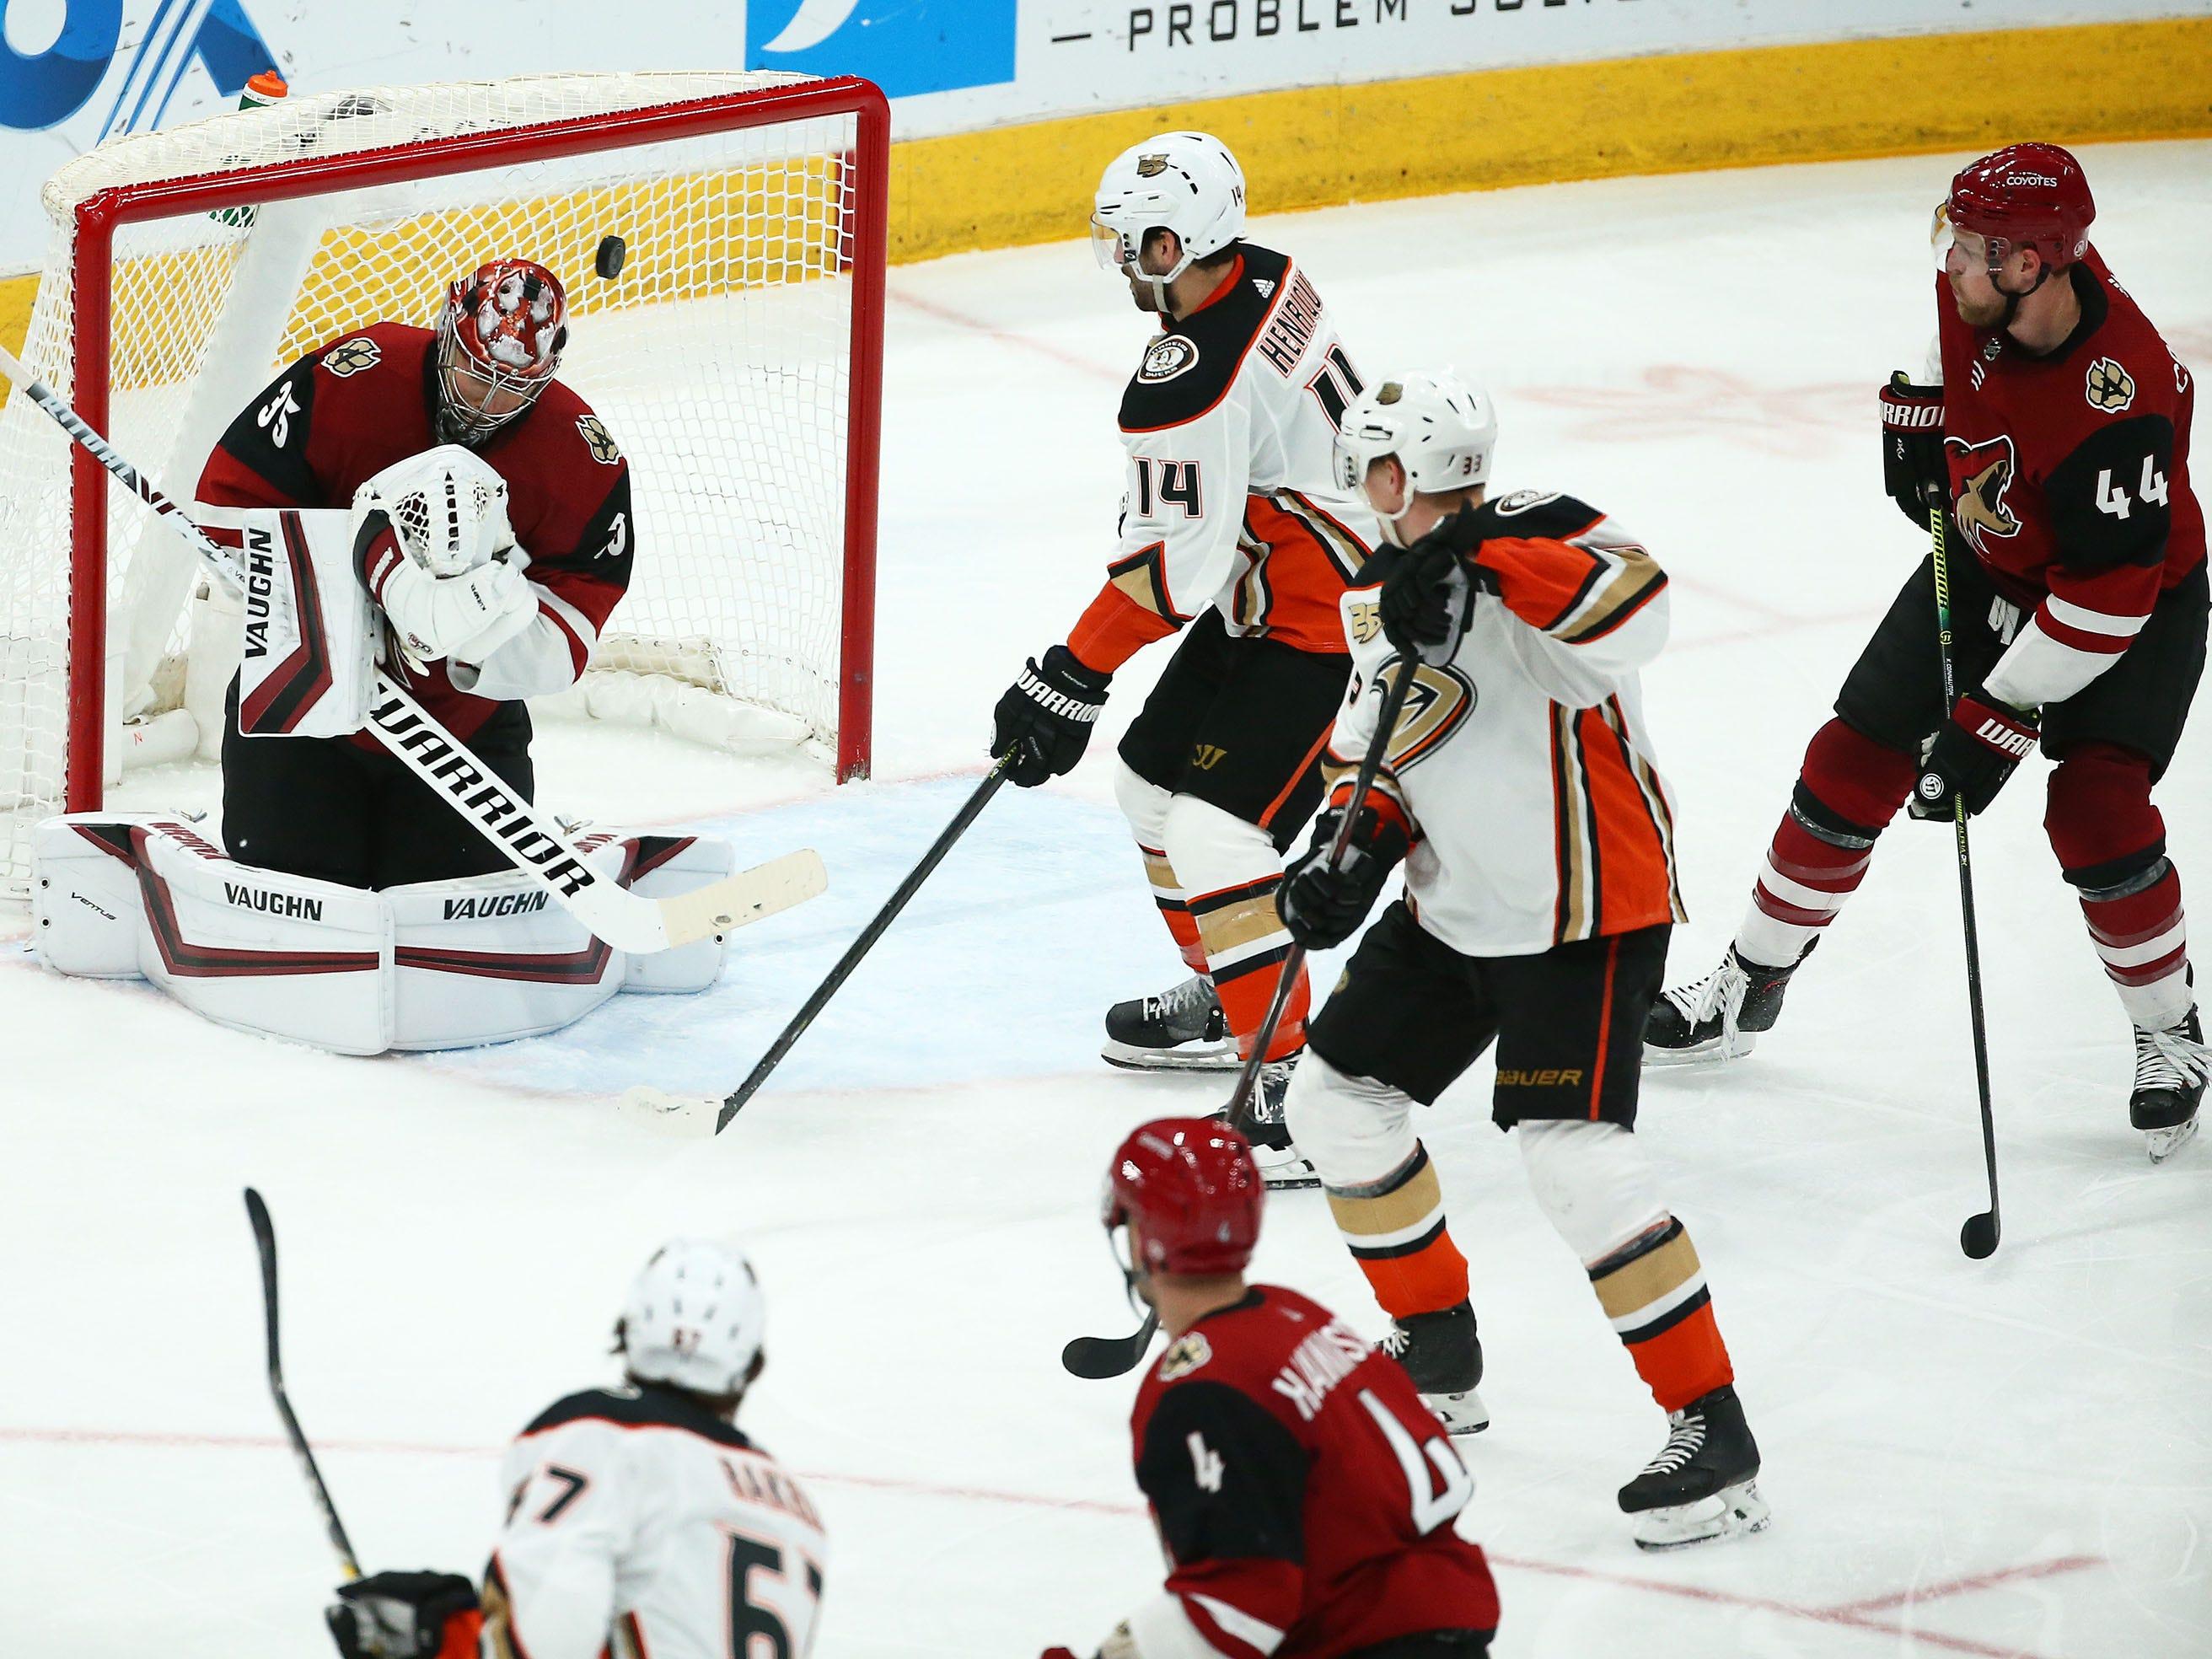 Anaheim Ducks center Adam Henrique (14) scores a goal against Arizona Coyotes goaltender Darcy Kuemper (35) in the third period on Mar. 5, 2019, at Gila River Arena in Glendale, Ariz.